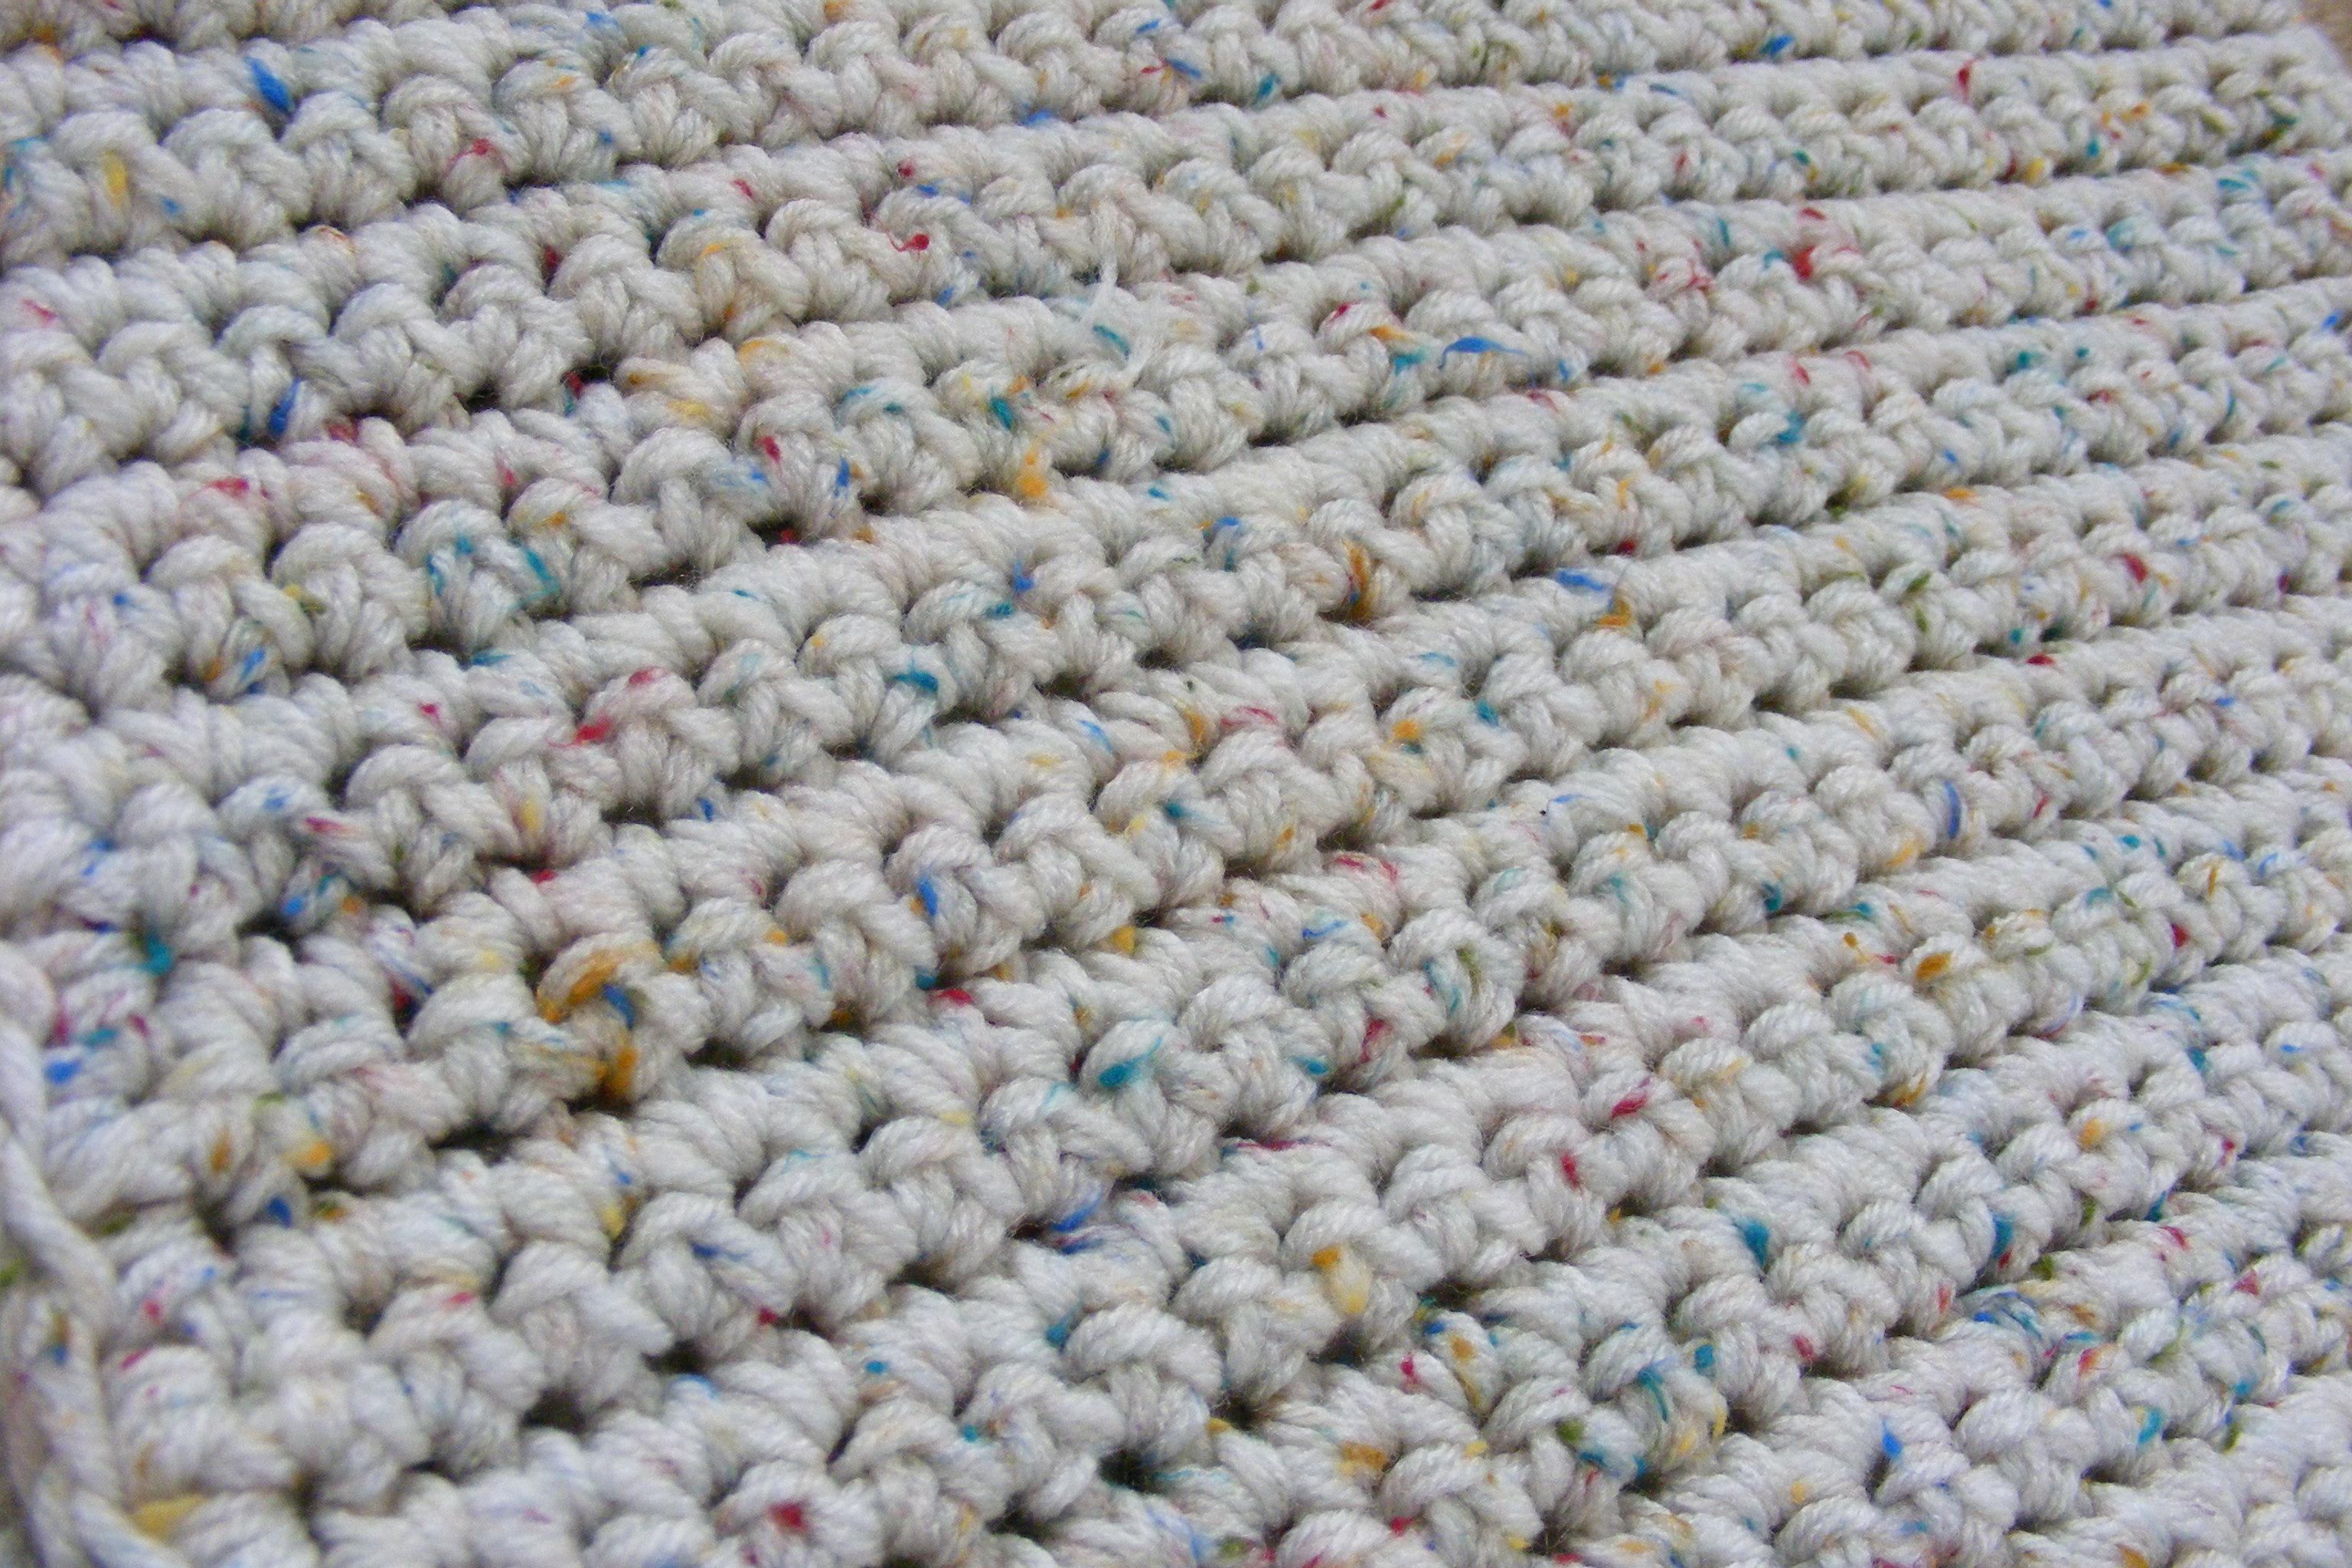 Begginer Crochet Projects Baby Blankets Single Crochet Ba Blanket Gretchkals Yarny Adventures